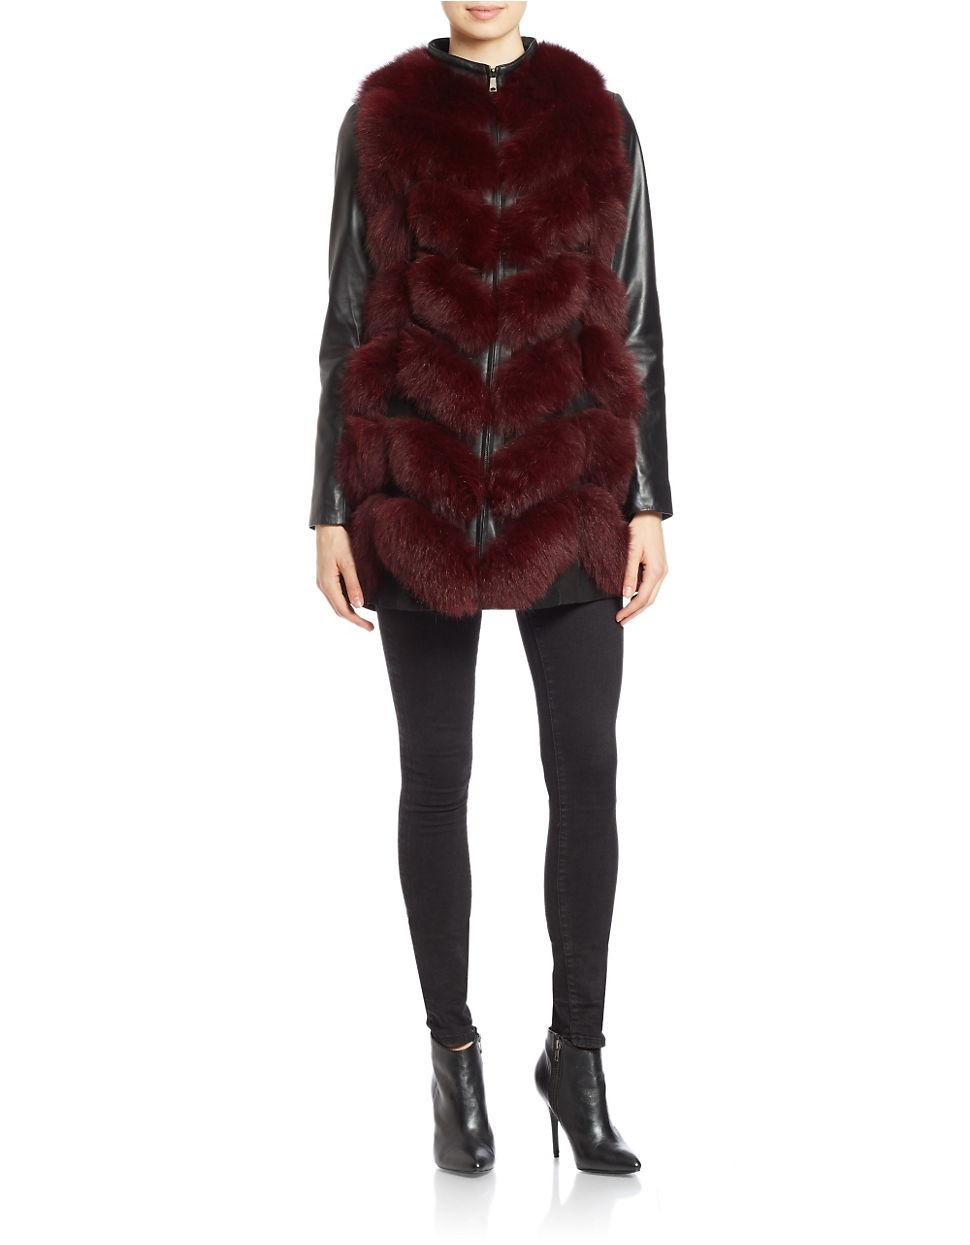 ea04ab7c5a4 Lyst - Badgley mischka Leather-sleeve Fox Fur Coat in Purple